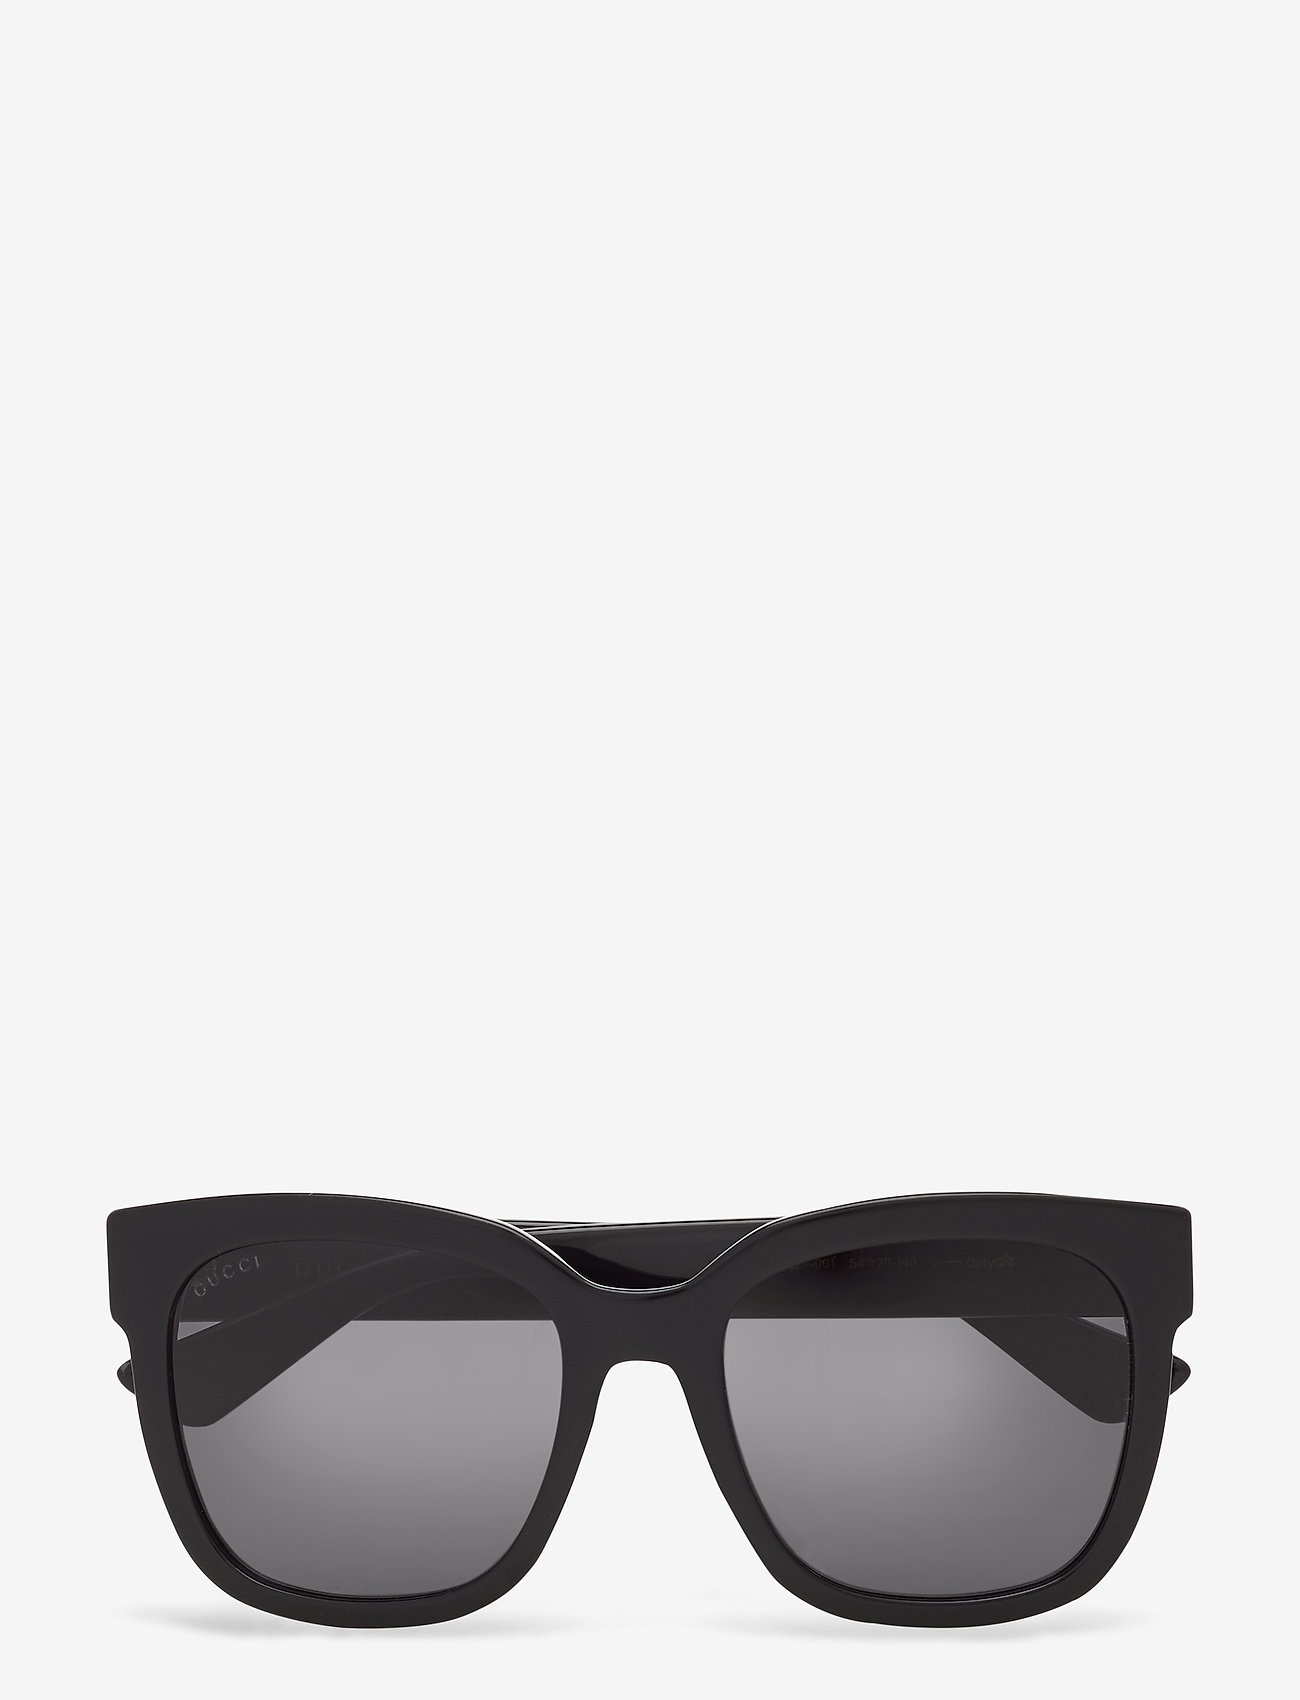 Gucci Sunglasses - GG0034S - d-muotoiset - black-black-grey - 0